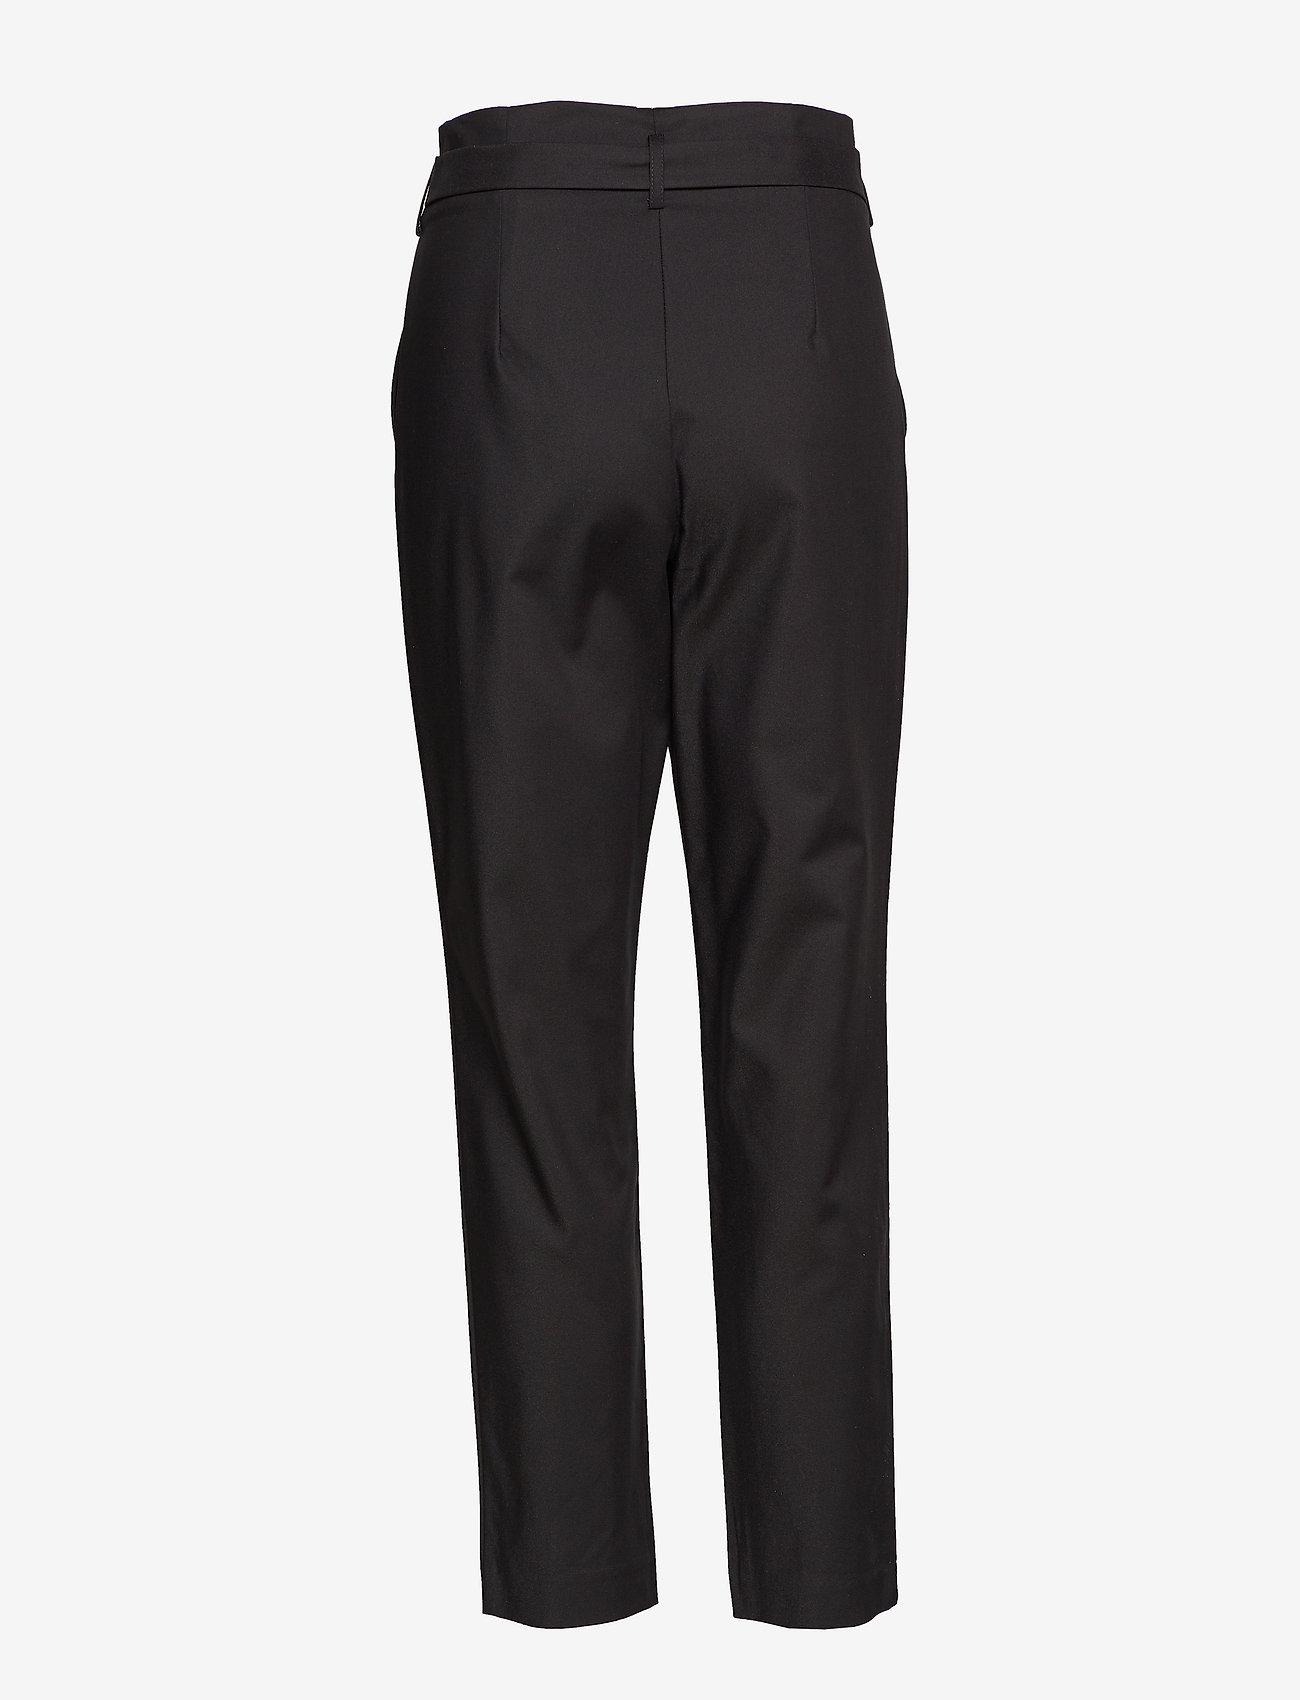 Vila - VISOFINA HWRE 7/8 PANT-NOOS - wide leg trousers - black - 1